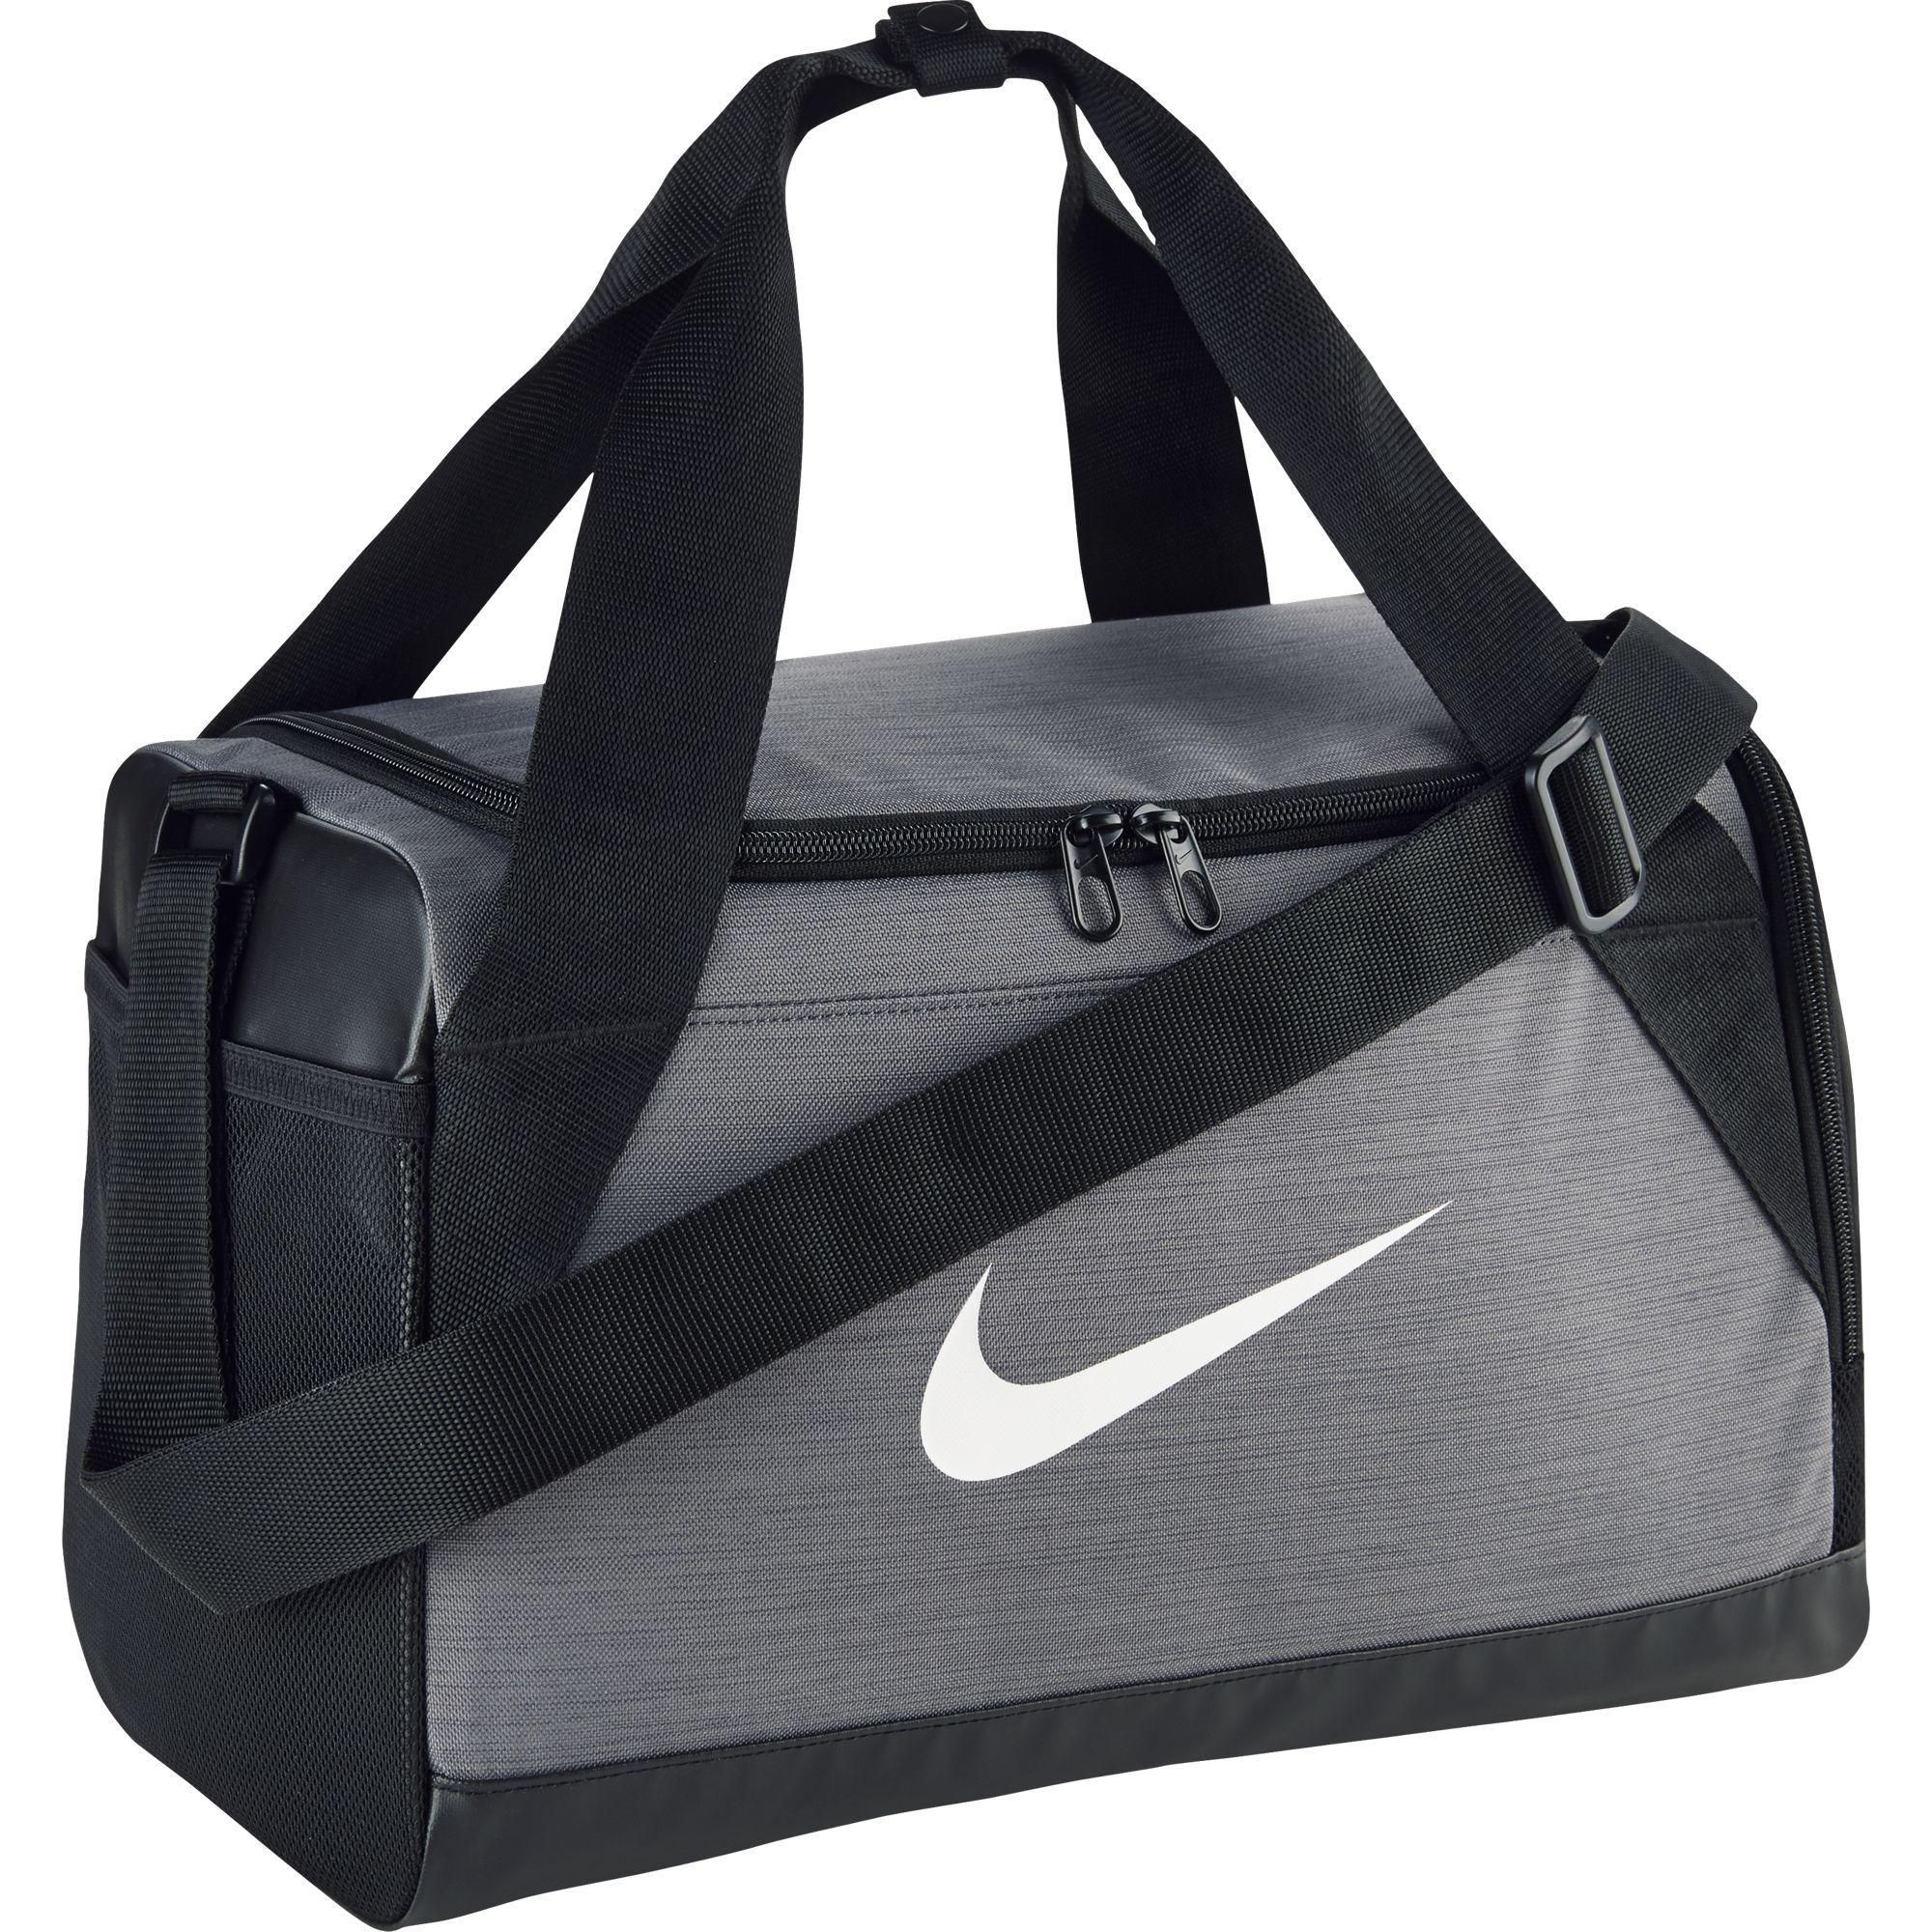 517ed61d57 Nike Brasilia Extra Small Training Duffel Bag - Flint Grey Black -  Tennisnuts.com